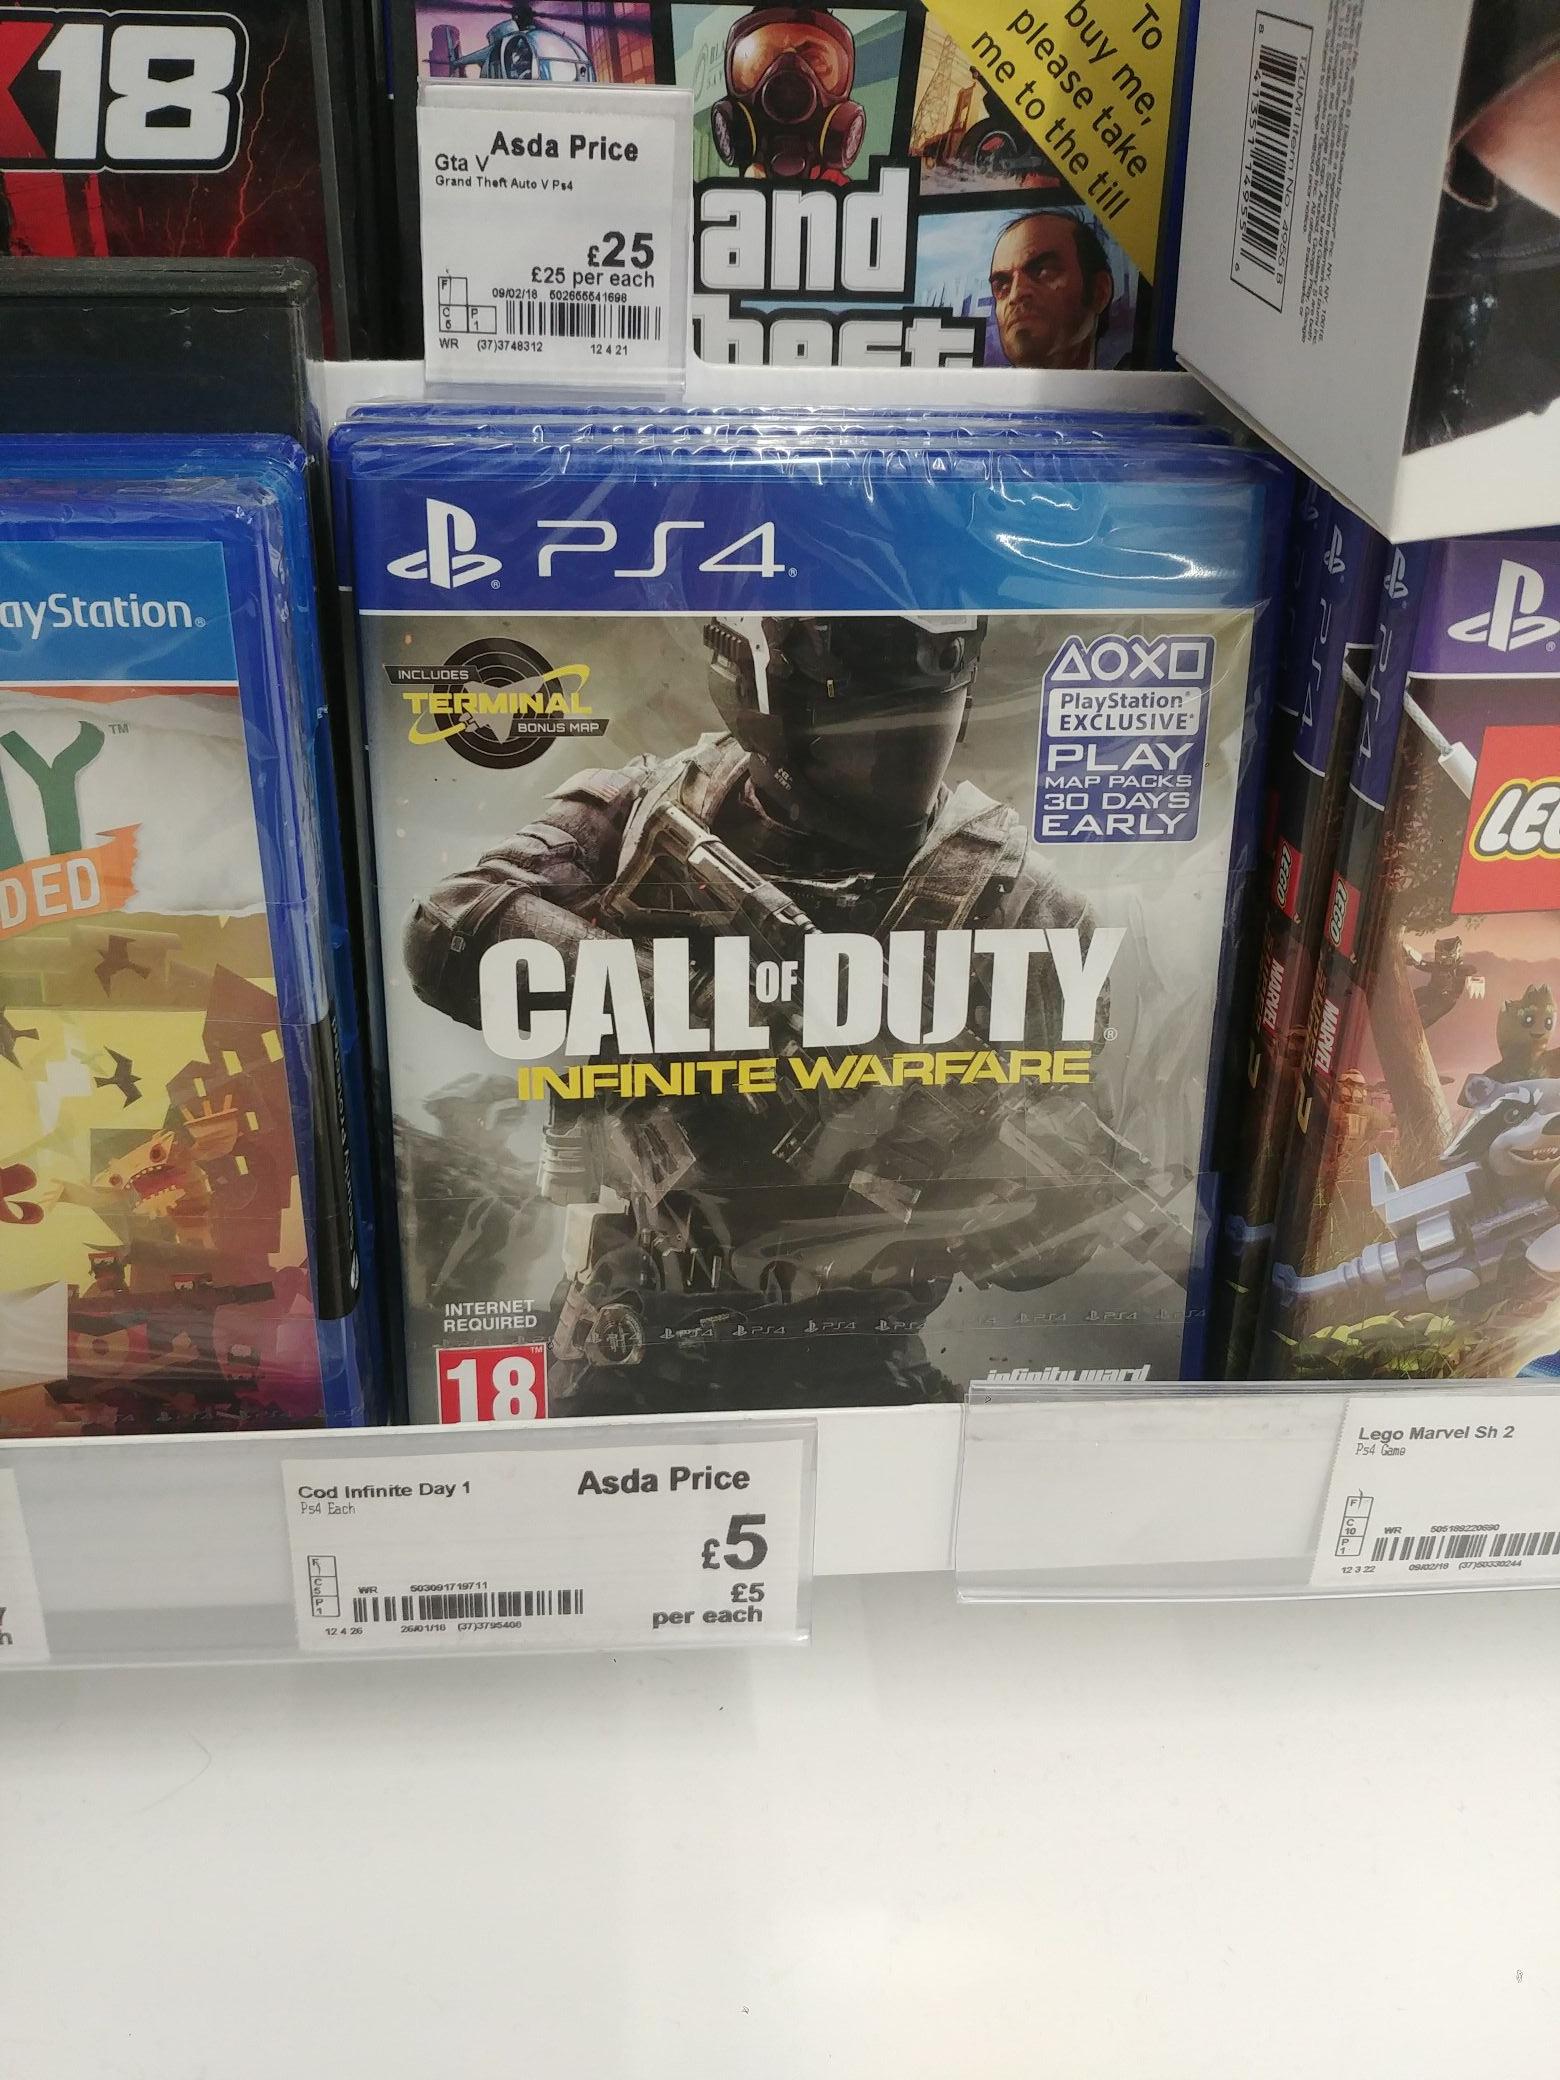 Call of duty infinite warfare PS4 £5 @ Asda - Canterbury